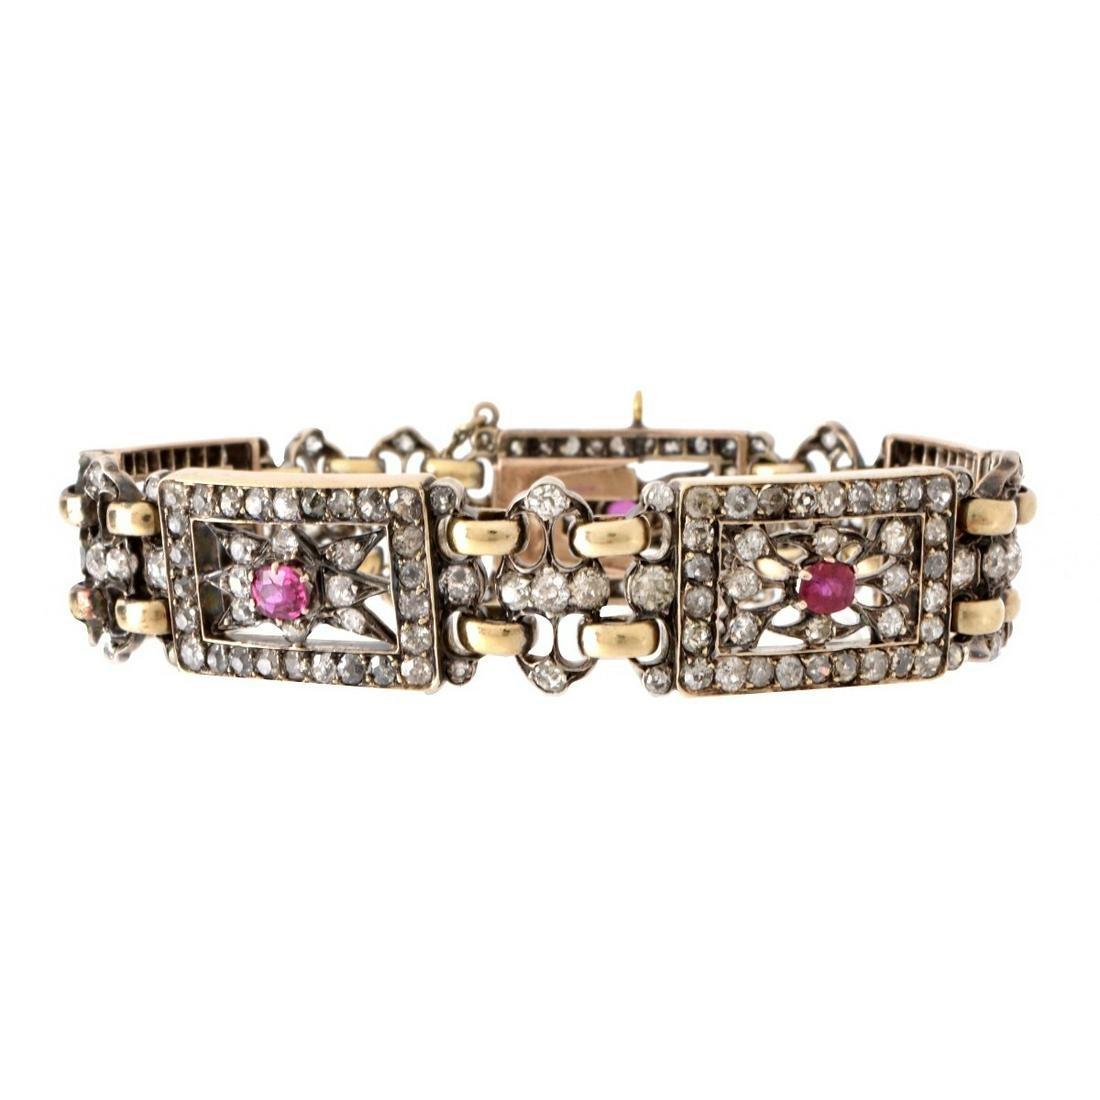 Diamond, Ruby, 18K and Silver Bracelet